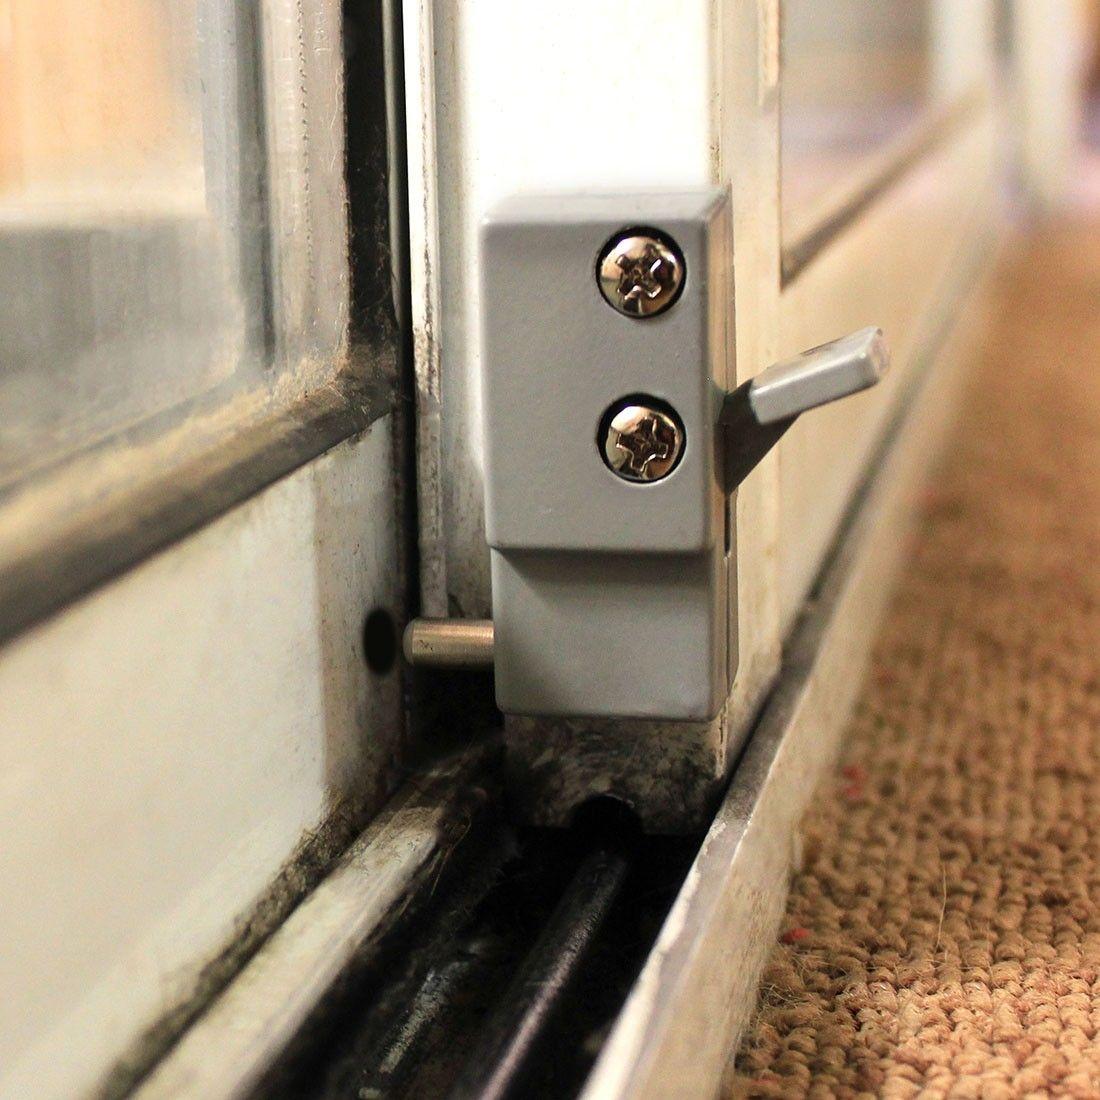 Sliding glass patio door security locks httptogethersandia sliding glass patio door security locks planetlyrics Images